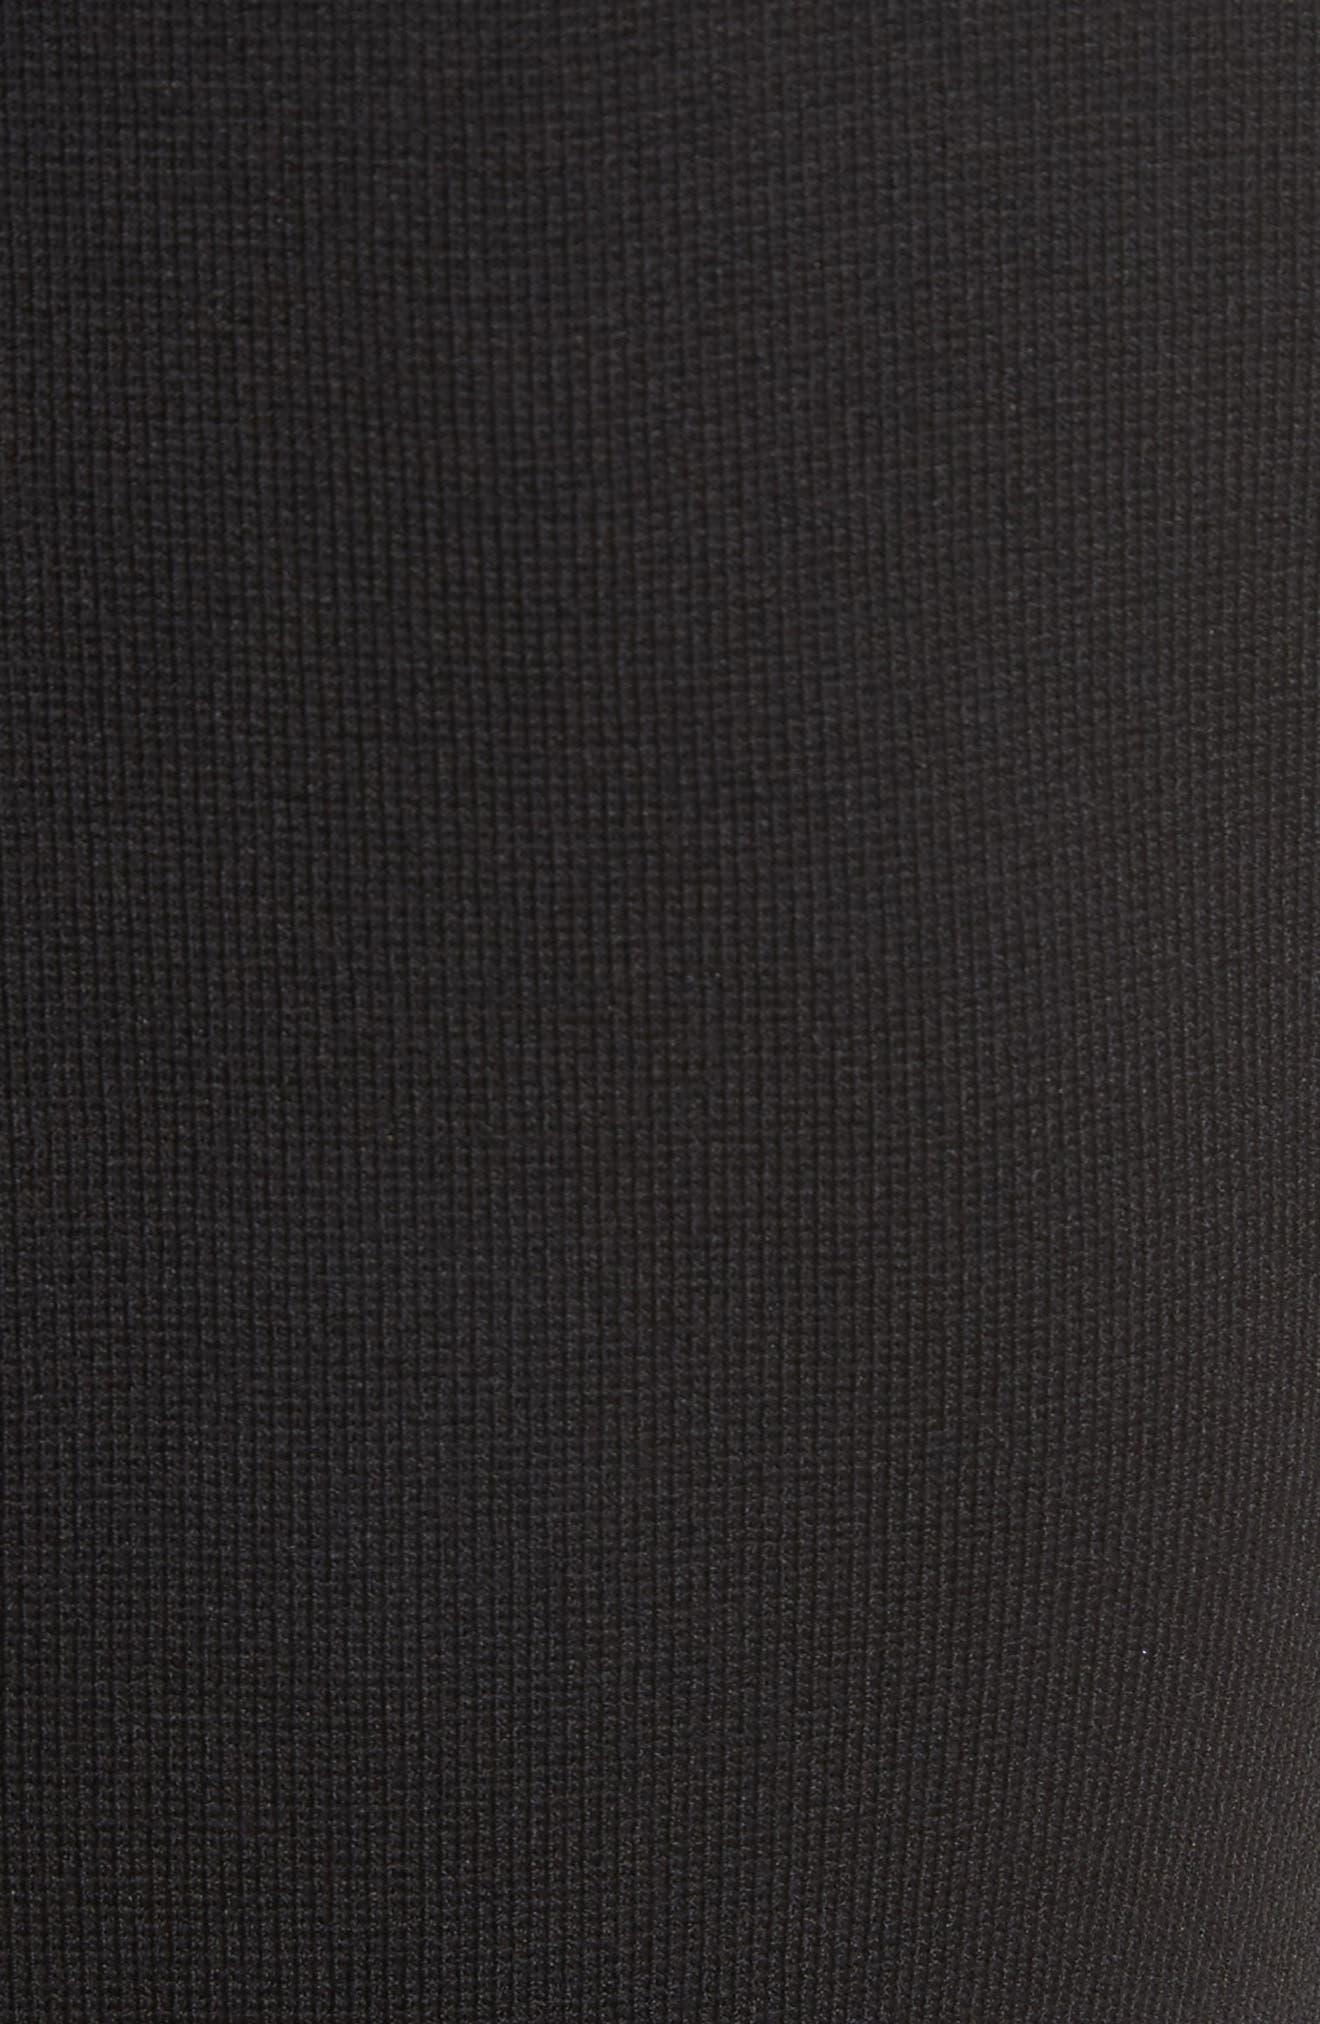 Texture Knit Fit & Flare Dress,                             Alternate thumbnail 5, color,                             Black